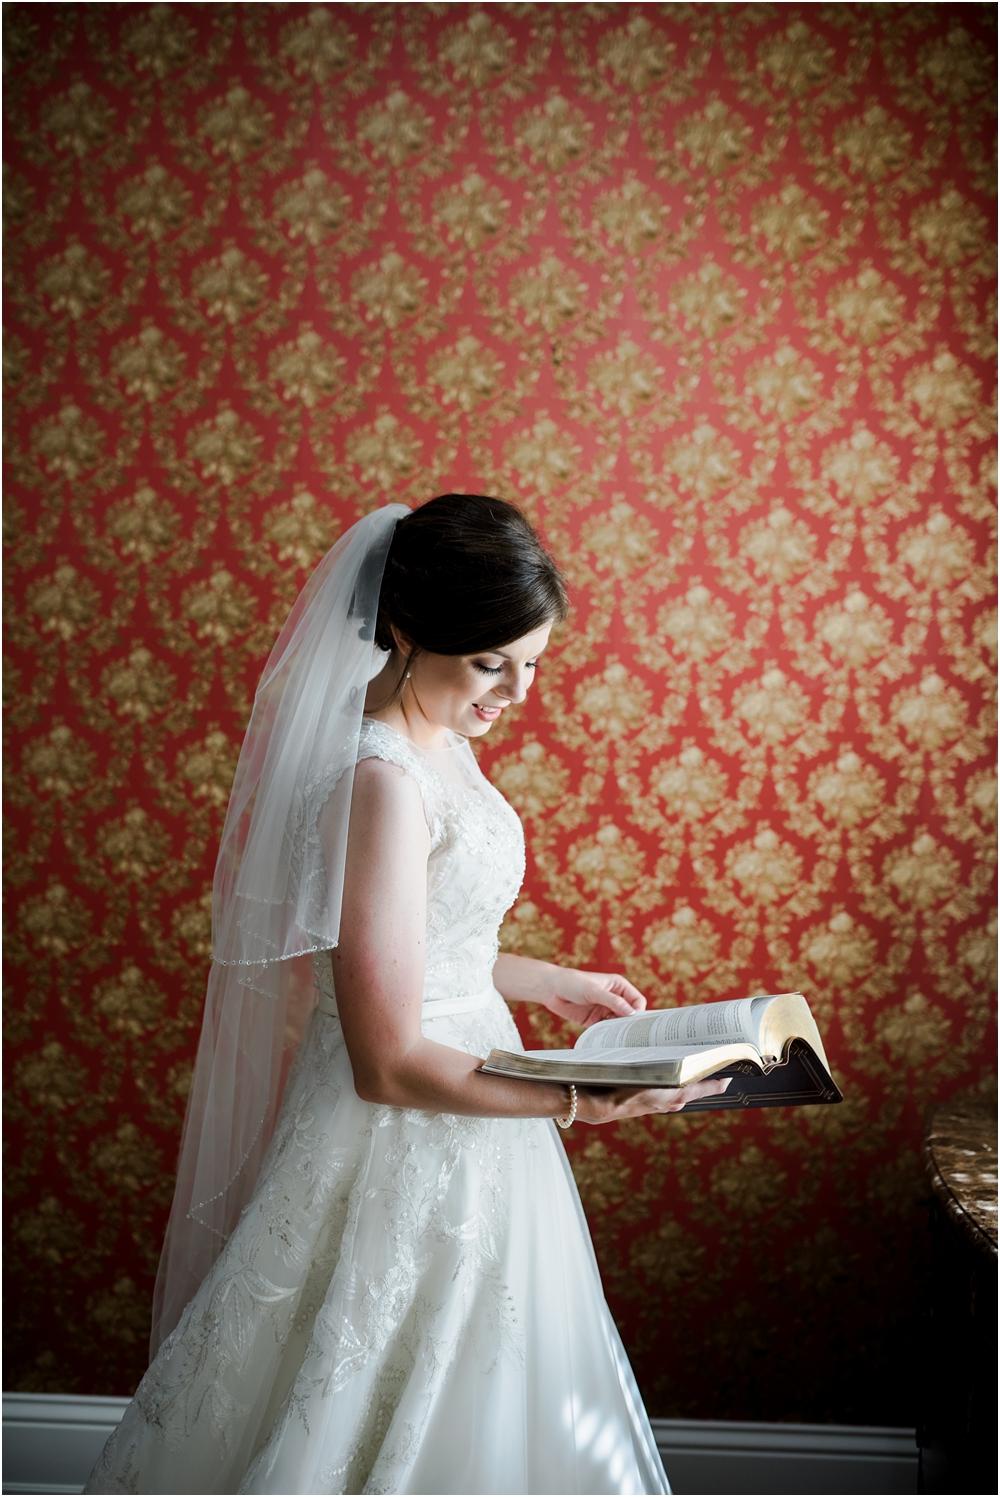 marianna-florida-wedding-photographer-kiersten-grant-29.jpg